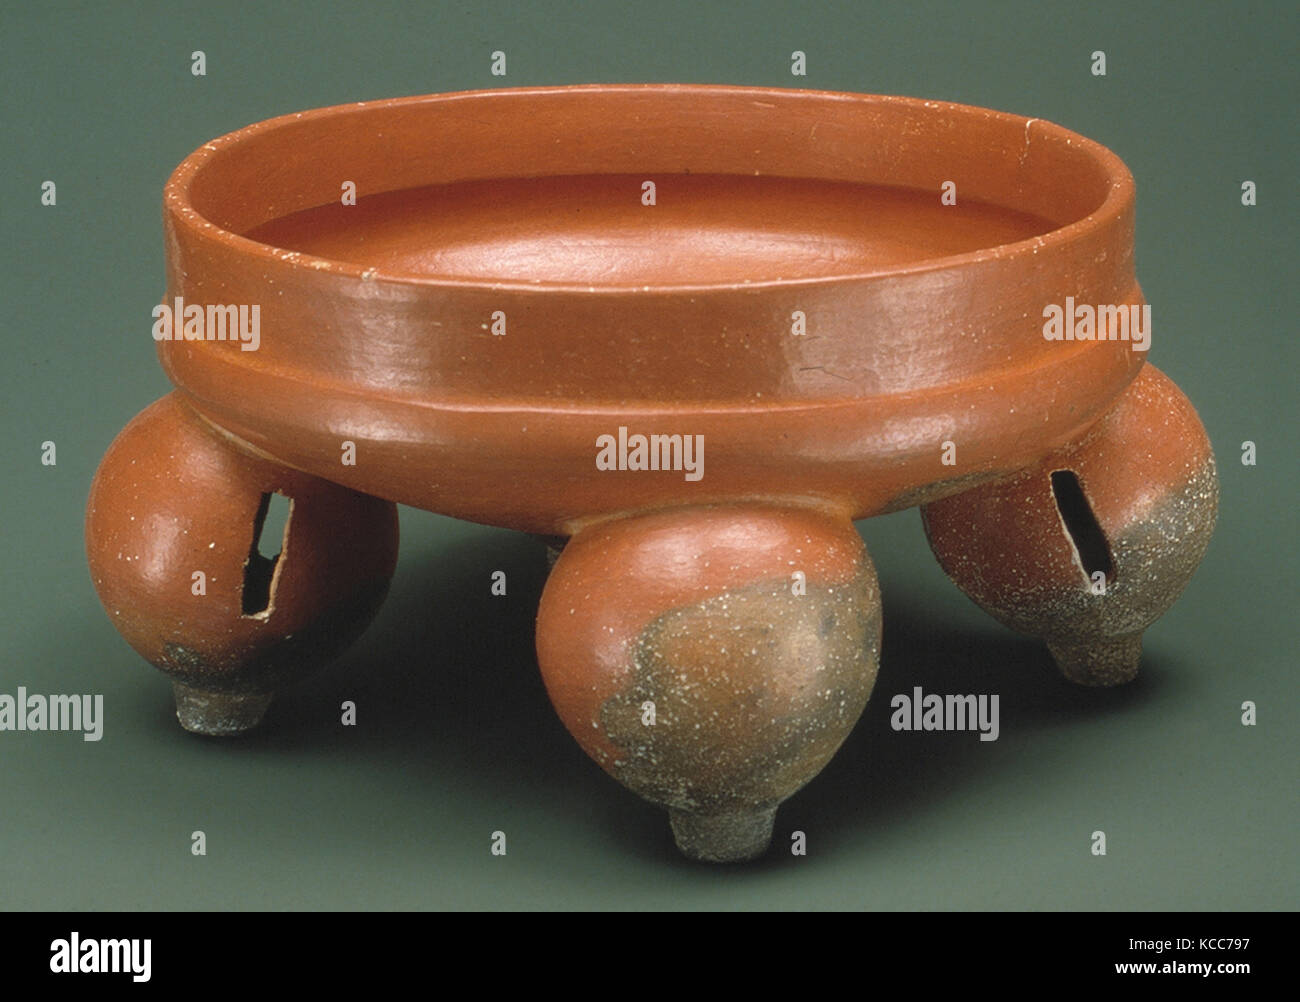 Tetrapod Bowl, 1st–4th century, Guatemala, Mesoamerica, Maya, Ceramic, H. 5 1/2 in. (14 cm), Ceramics-Containers, - Stock Image